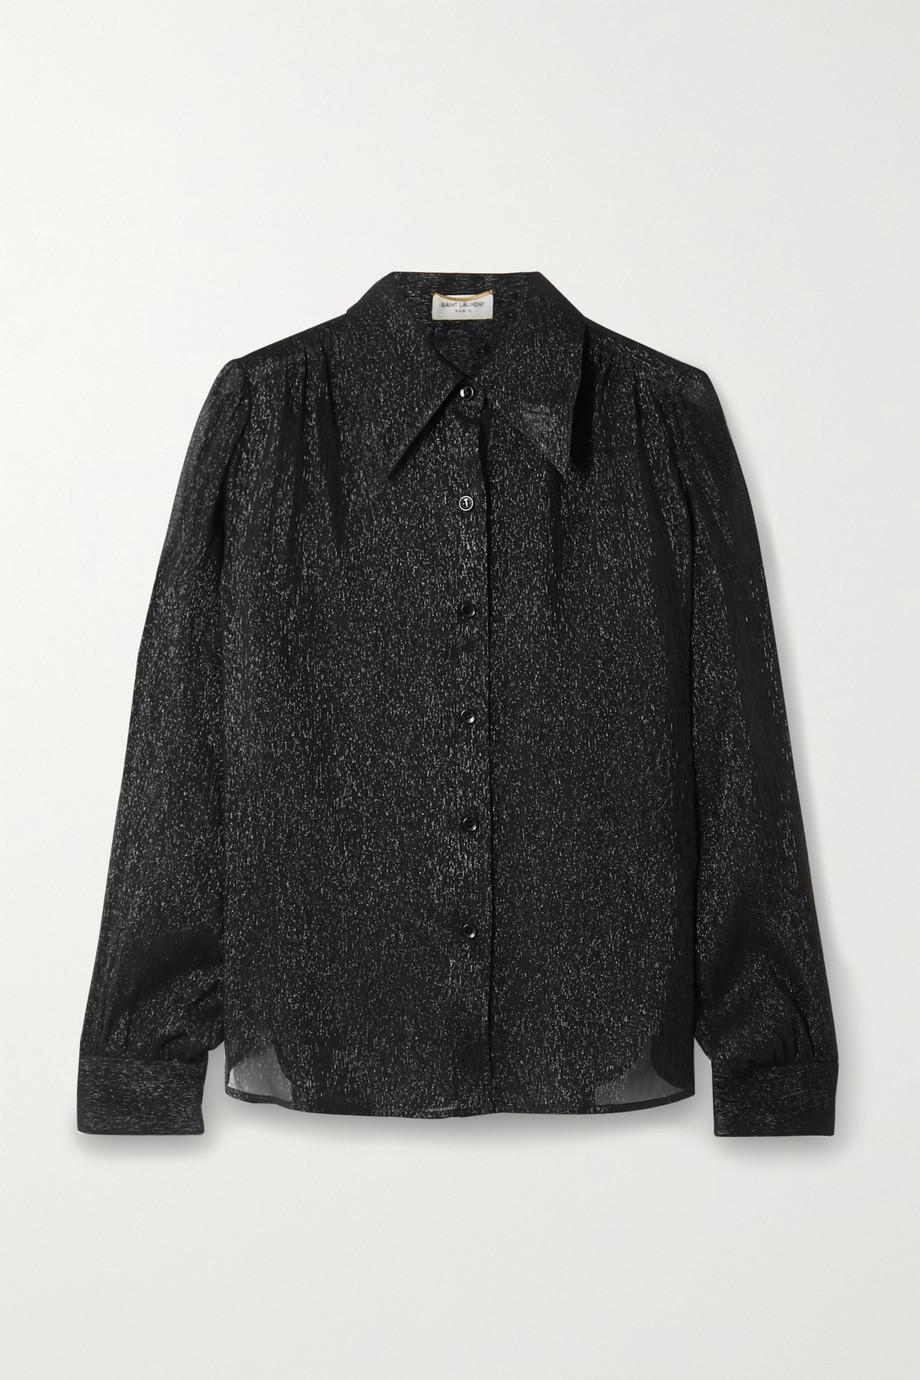 SAINT LAURENT Metallic silk and Lurex-blend crepon shirt